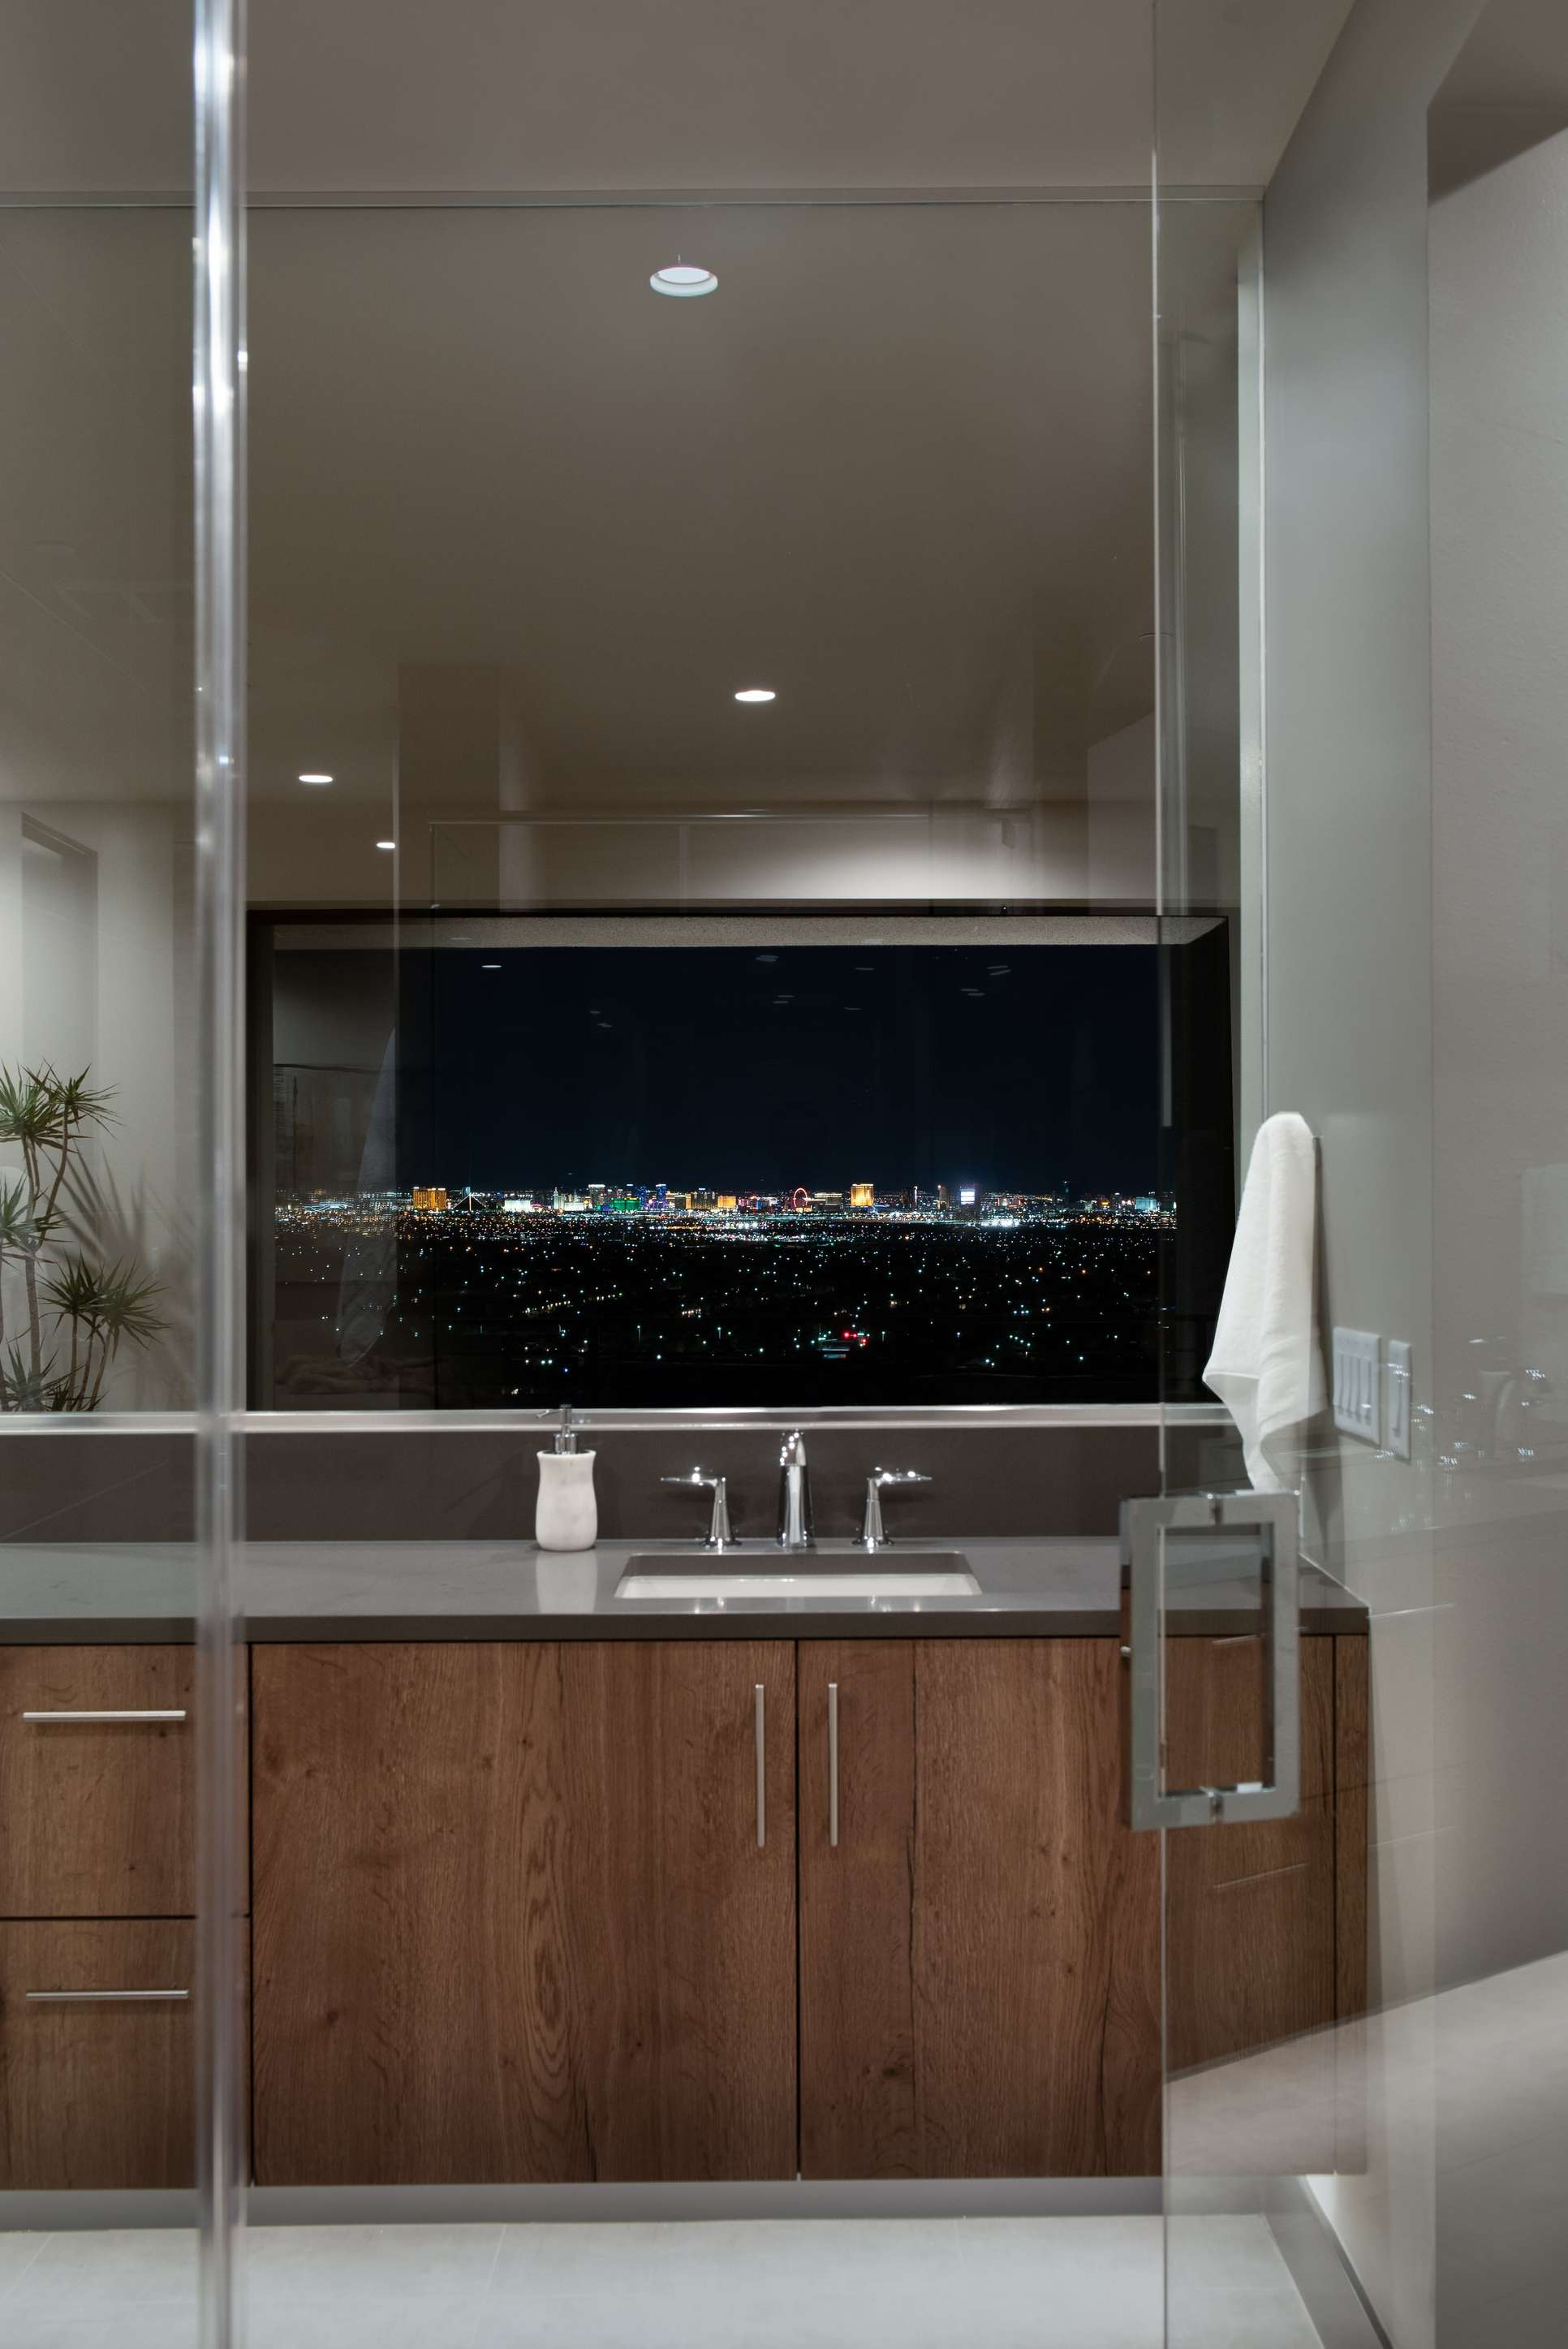 Apex - Bathroom:Apex - Bathroom